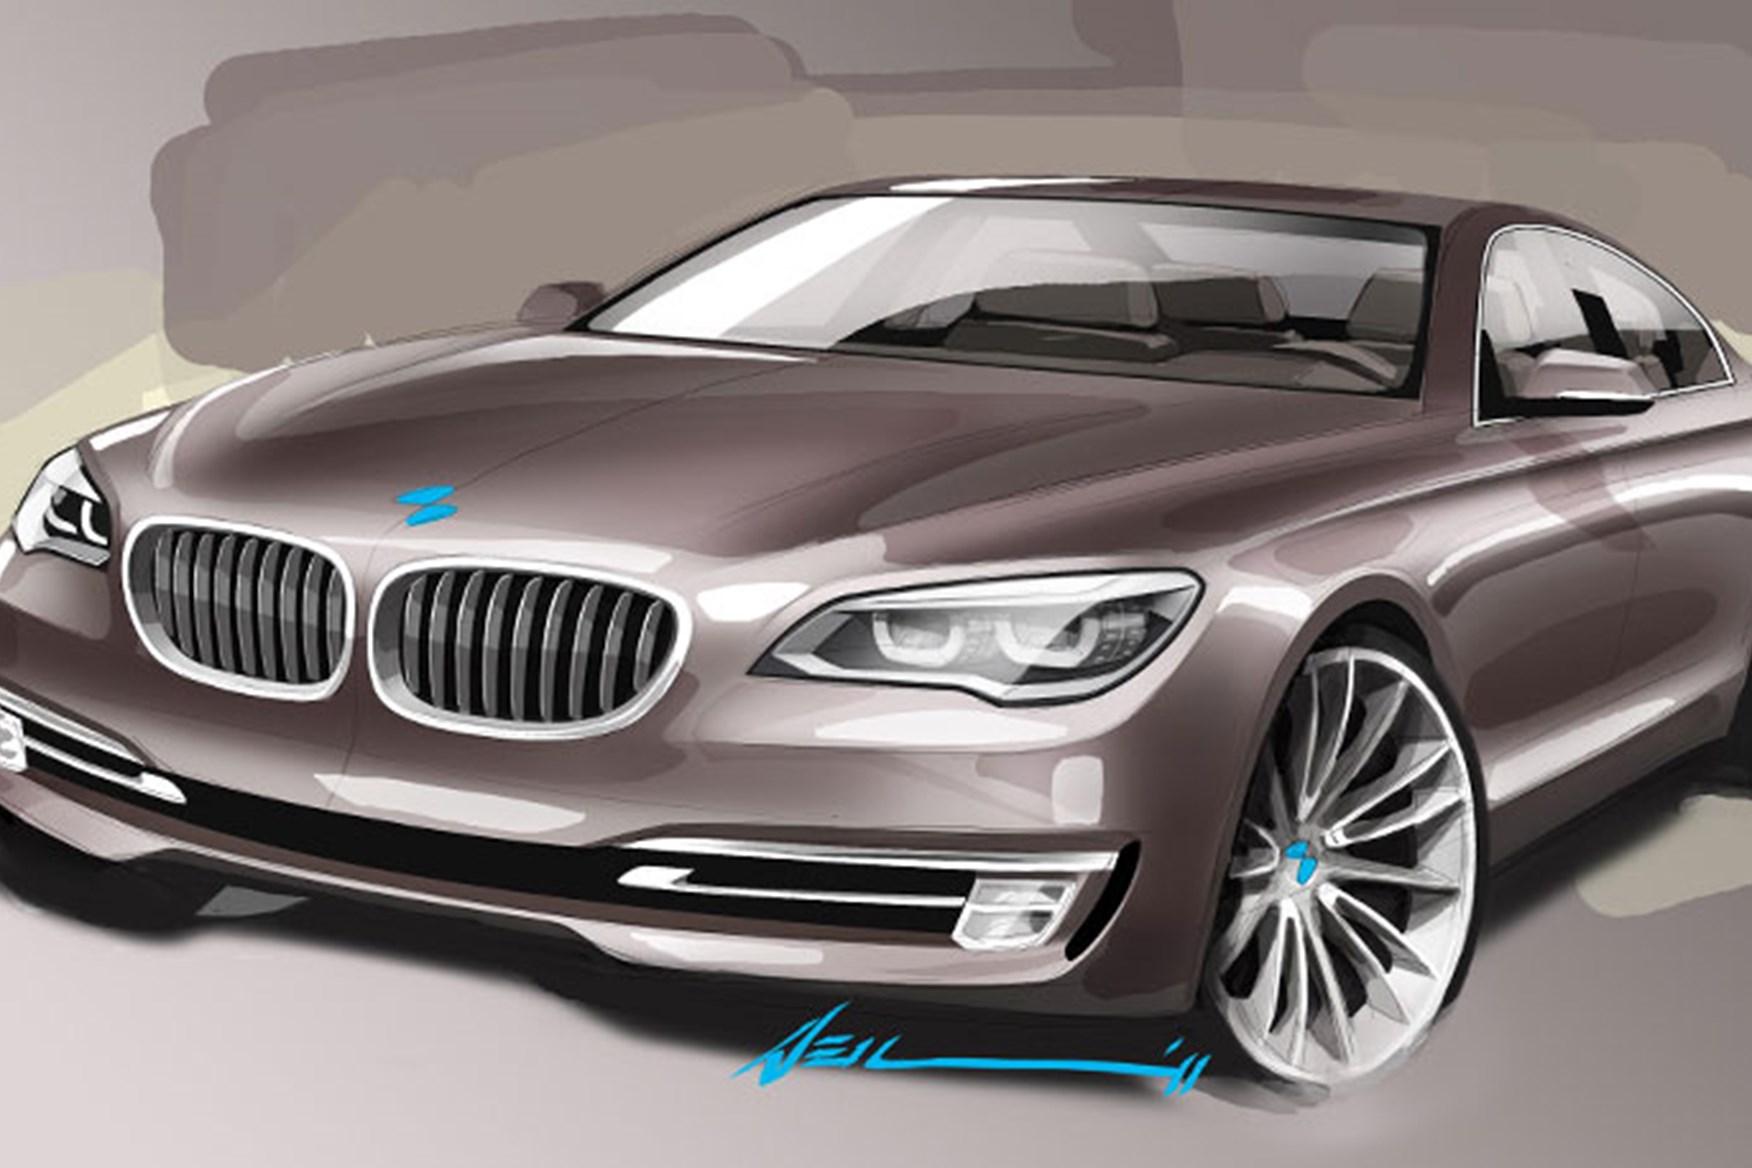 Bon ... BMW 7 Series Design Sketch (NB The Current Model!)